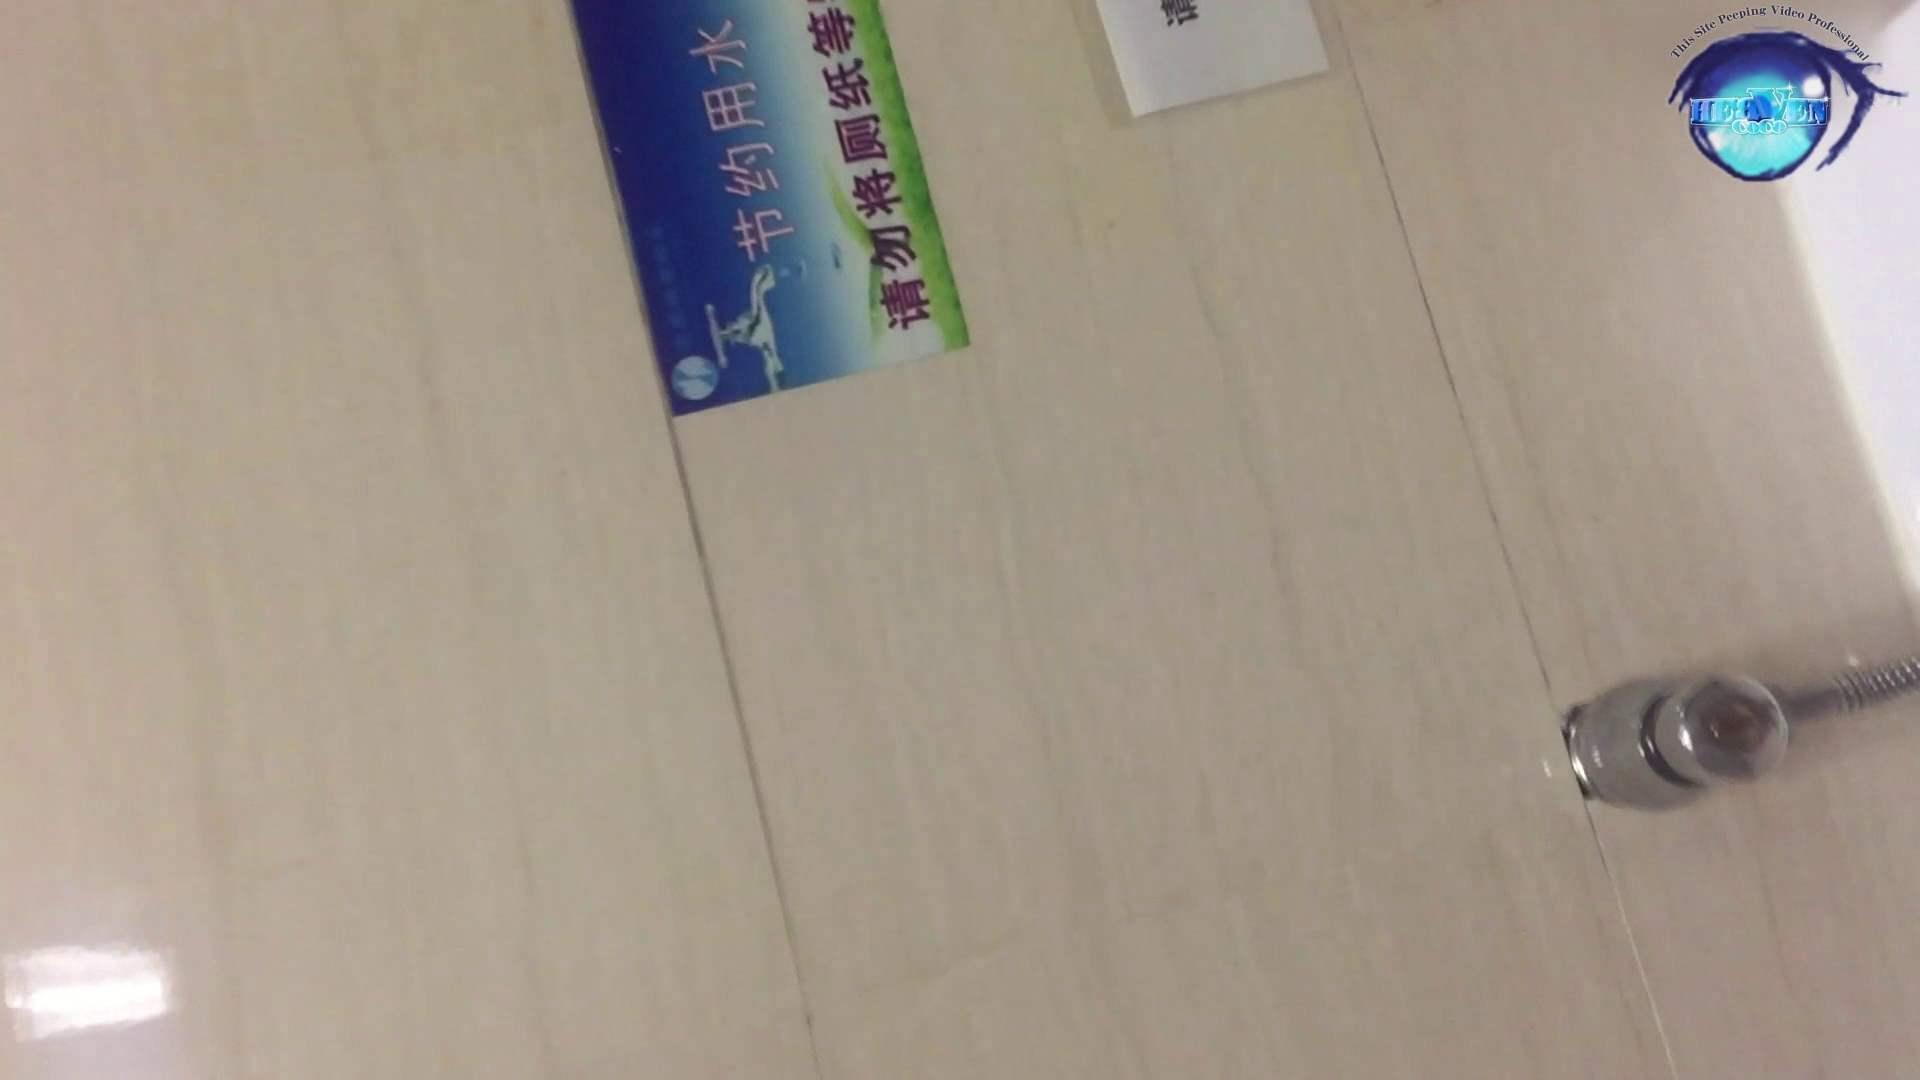 GOD HAND 芸術大学盗撮‼vol.72 盗撮師作品 ヌード画像 84pic 54